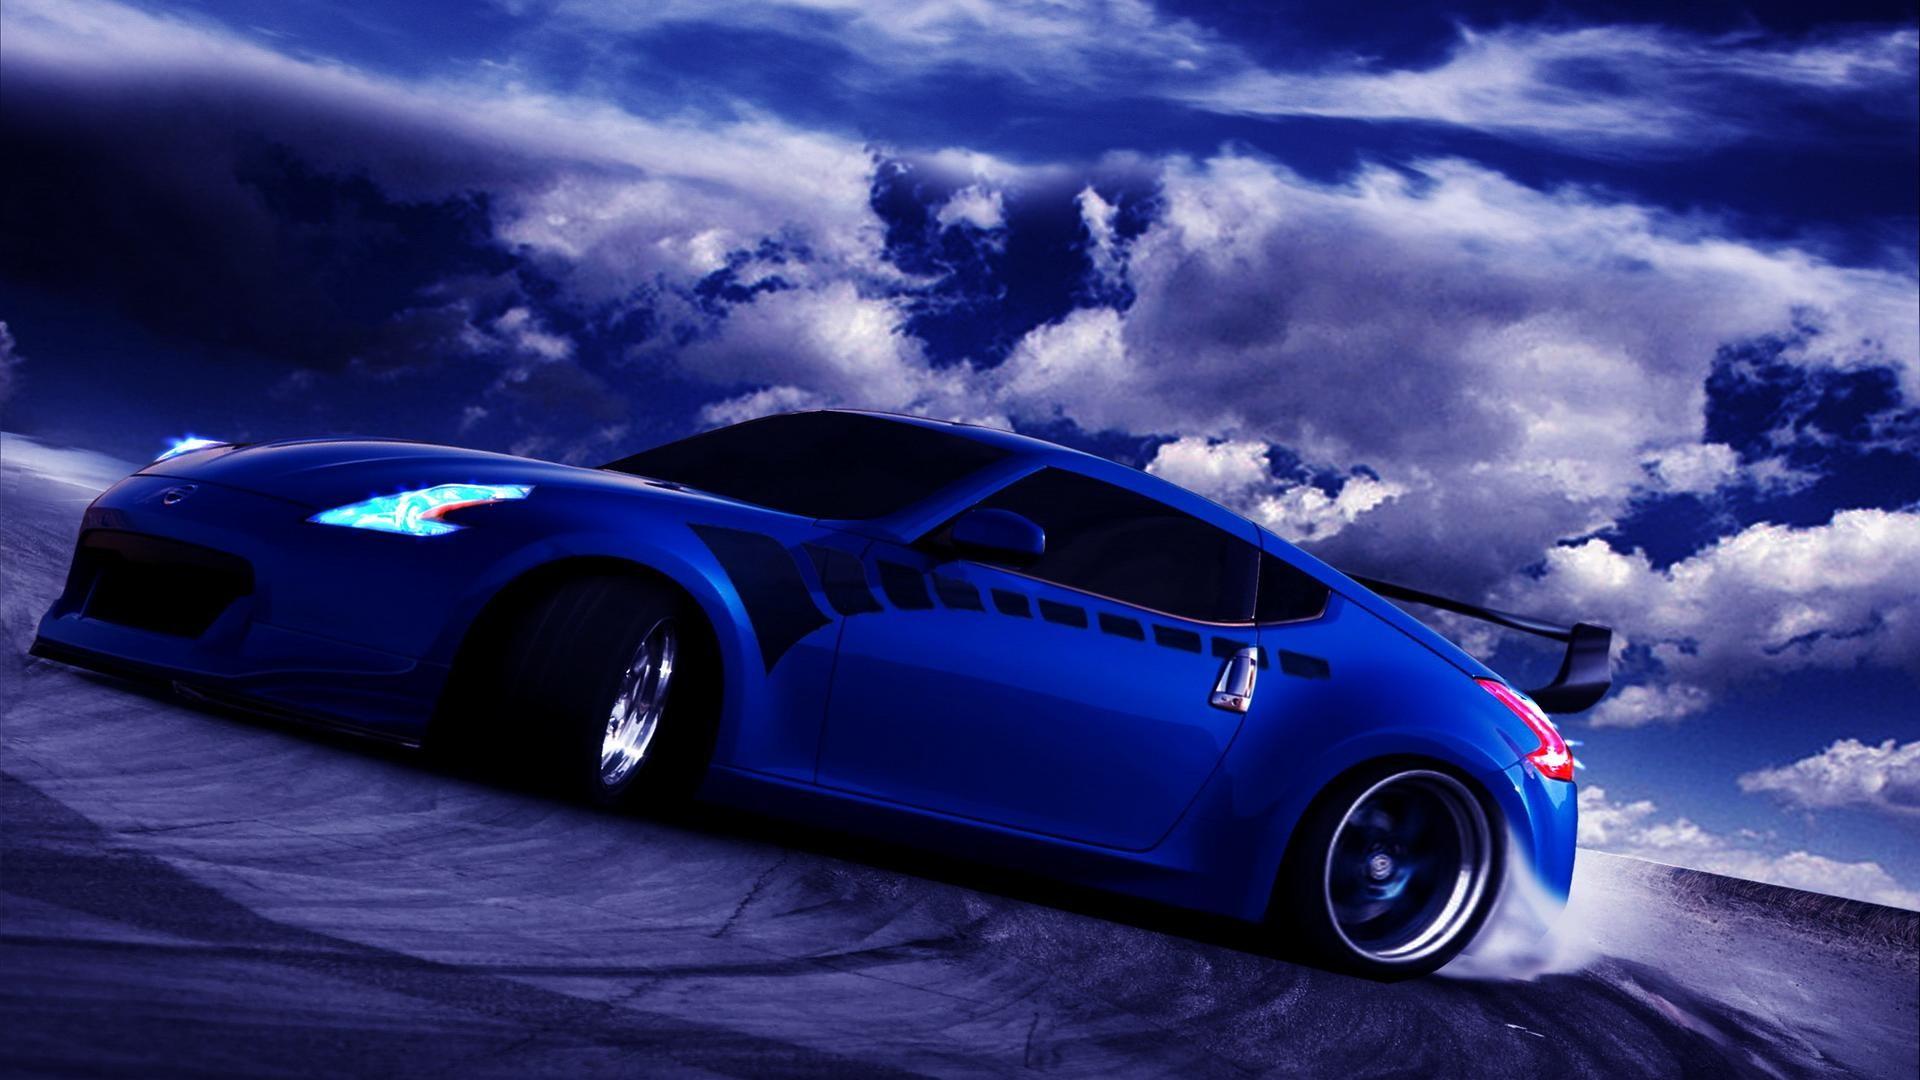 cool rich blue [1920×1080] via Classy Bro